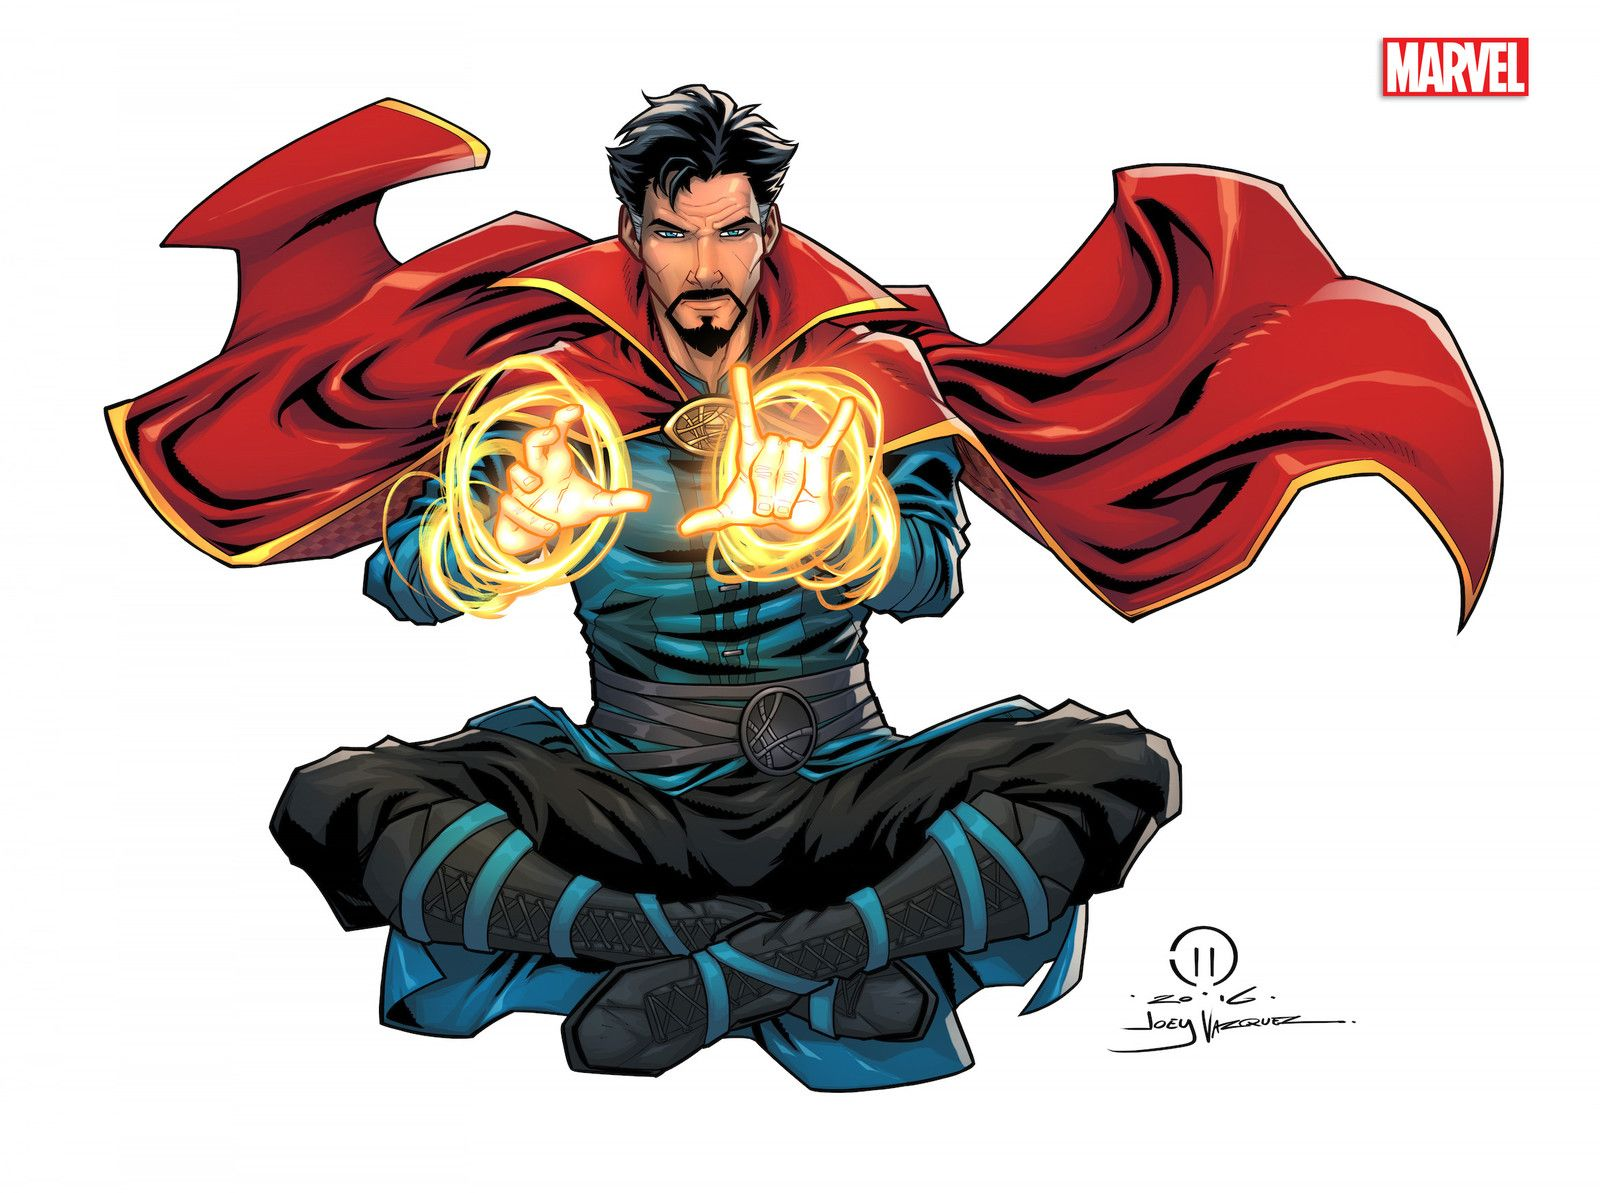 Au77 Doctor Strange Hero Illustration Art: Pin By Jairo Motino On Characters